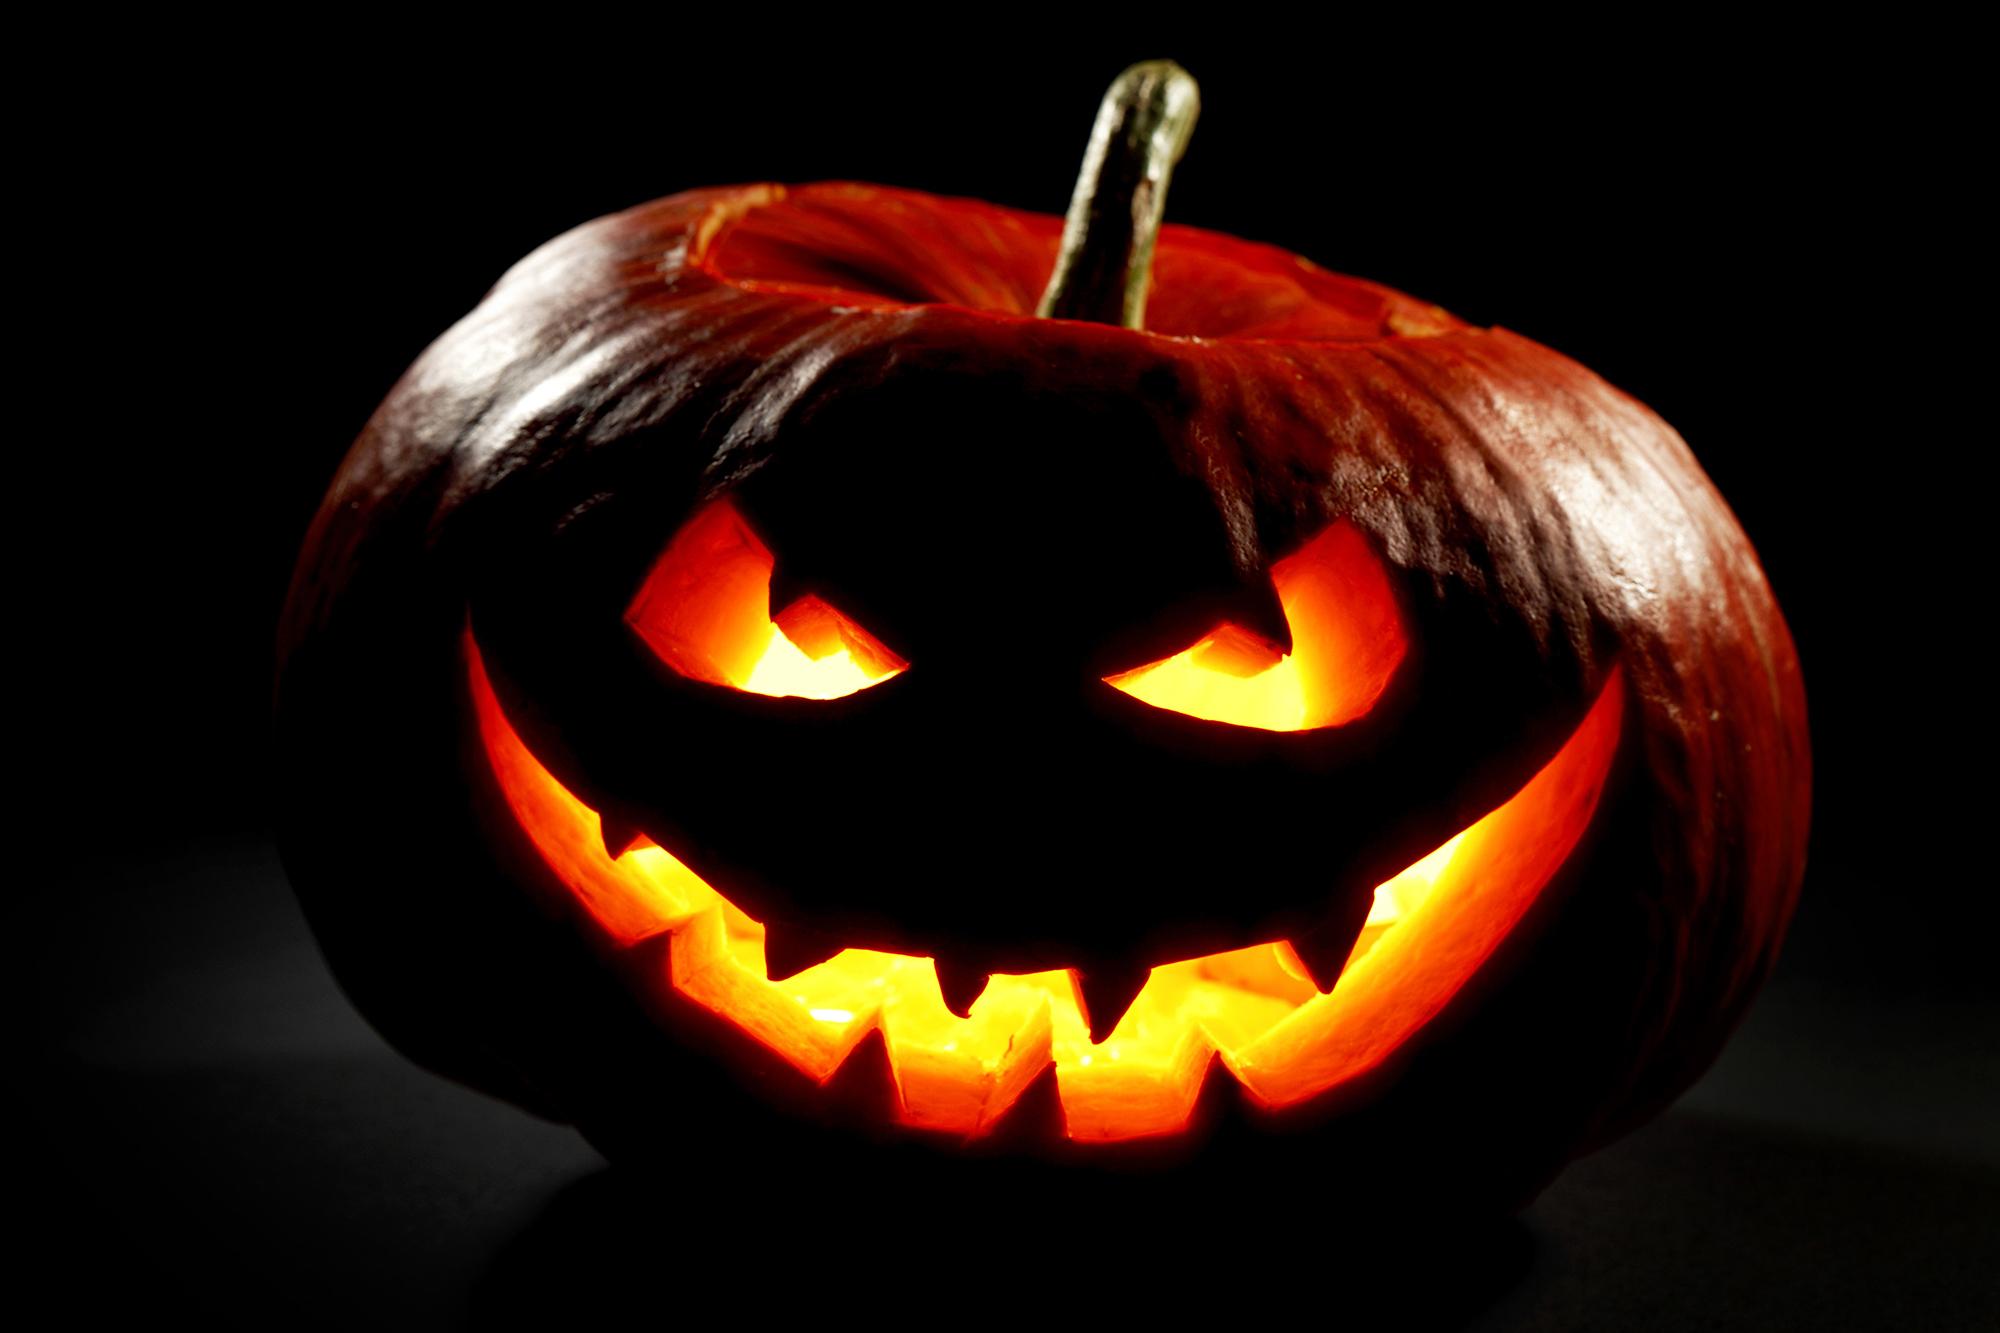 Пример тыквы на Хэллоуин